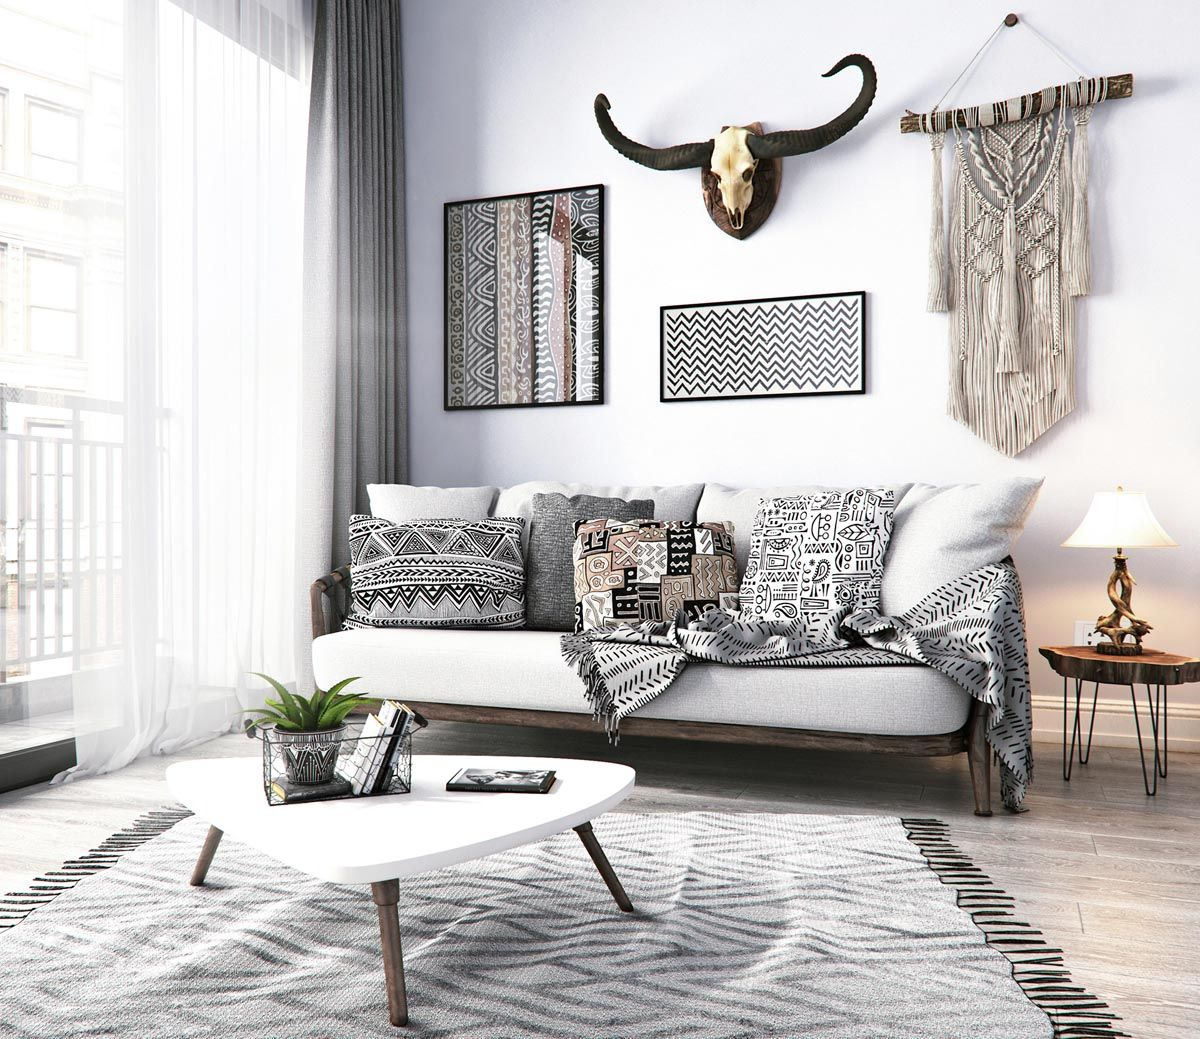 Modern Monochrome Tribal Decor | Lucious Living Rooms | Pinterest ...